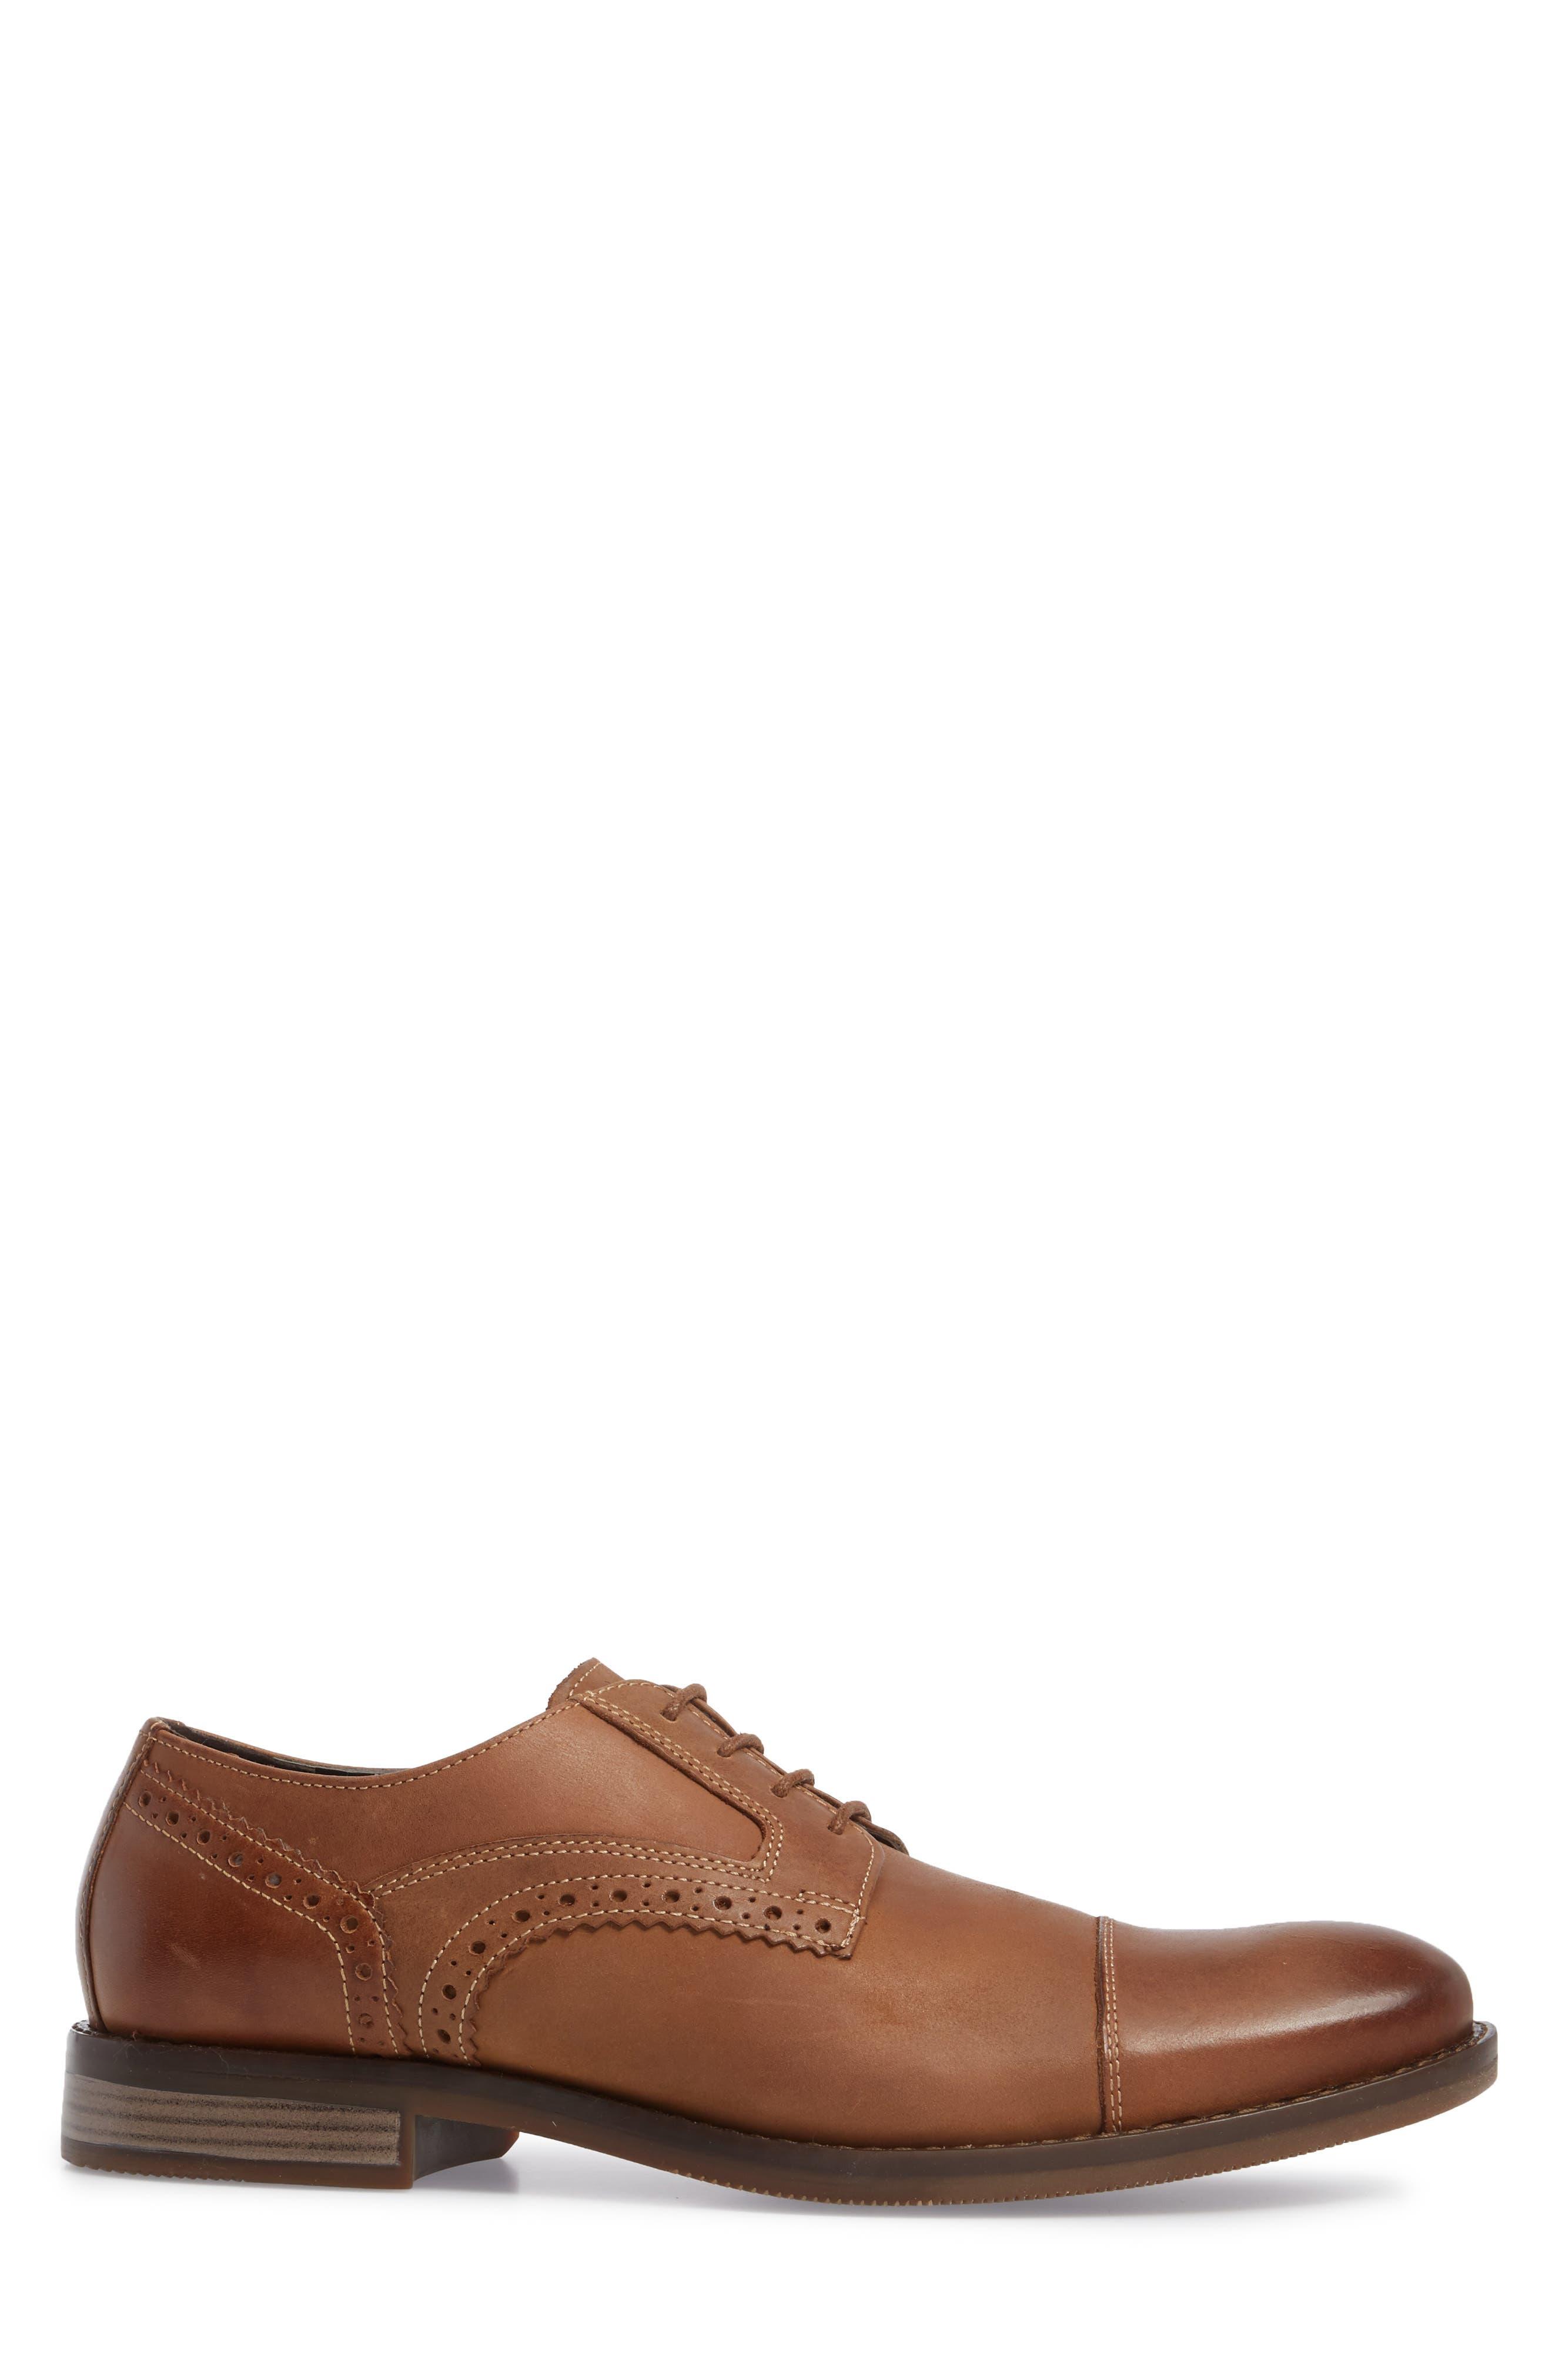 Wynston Cap Toe Blucher,                             Alternate thumbnail 3, color,                             Tobacco Leather